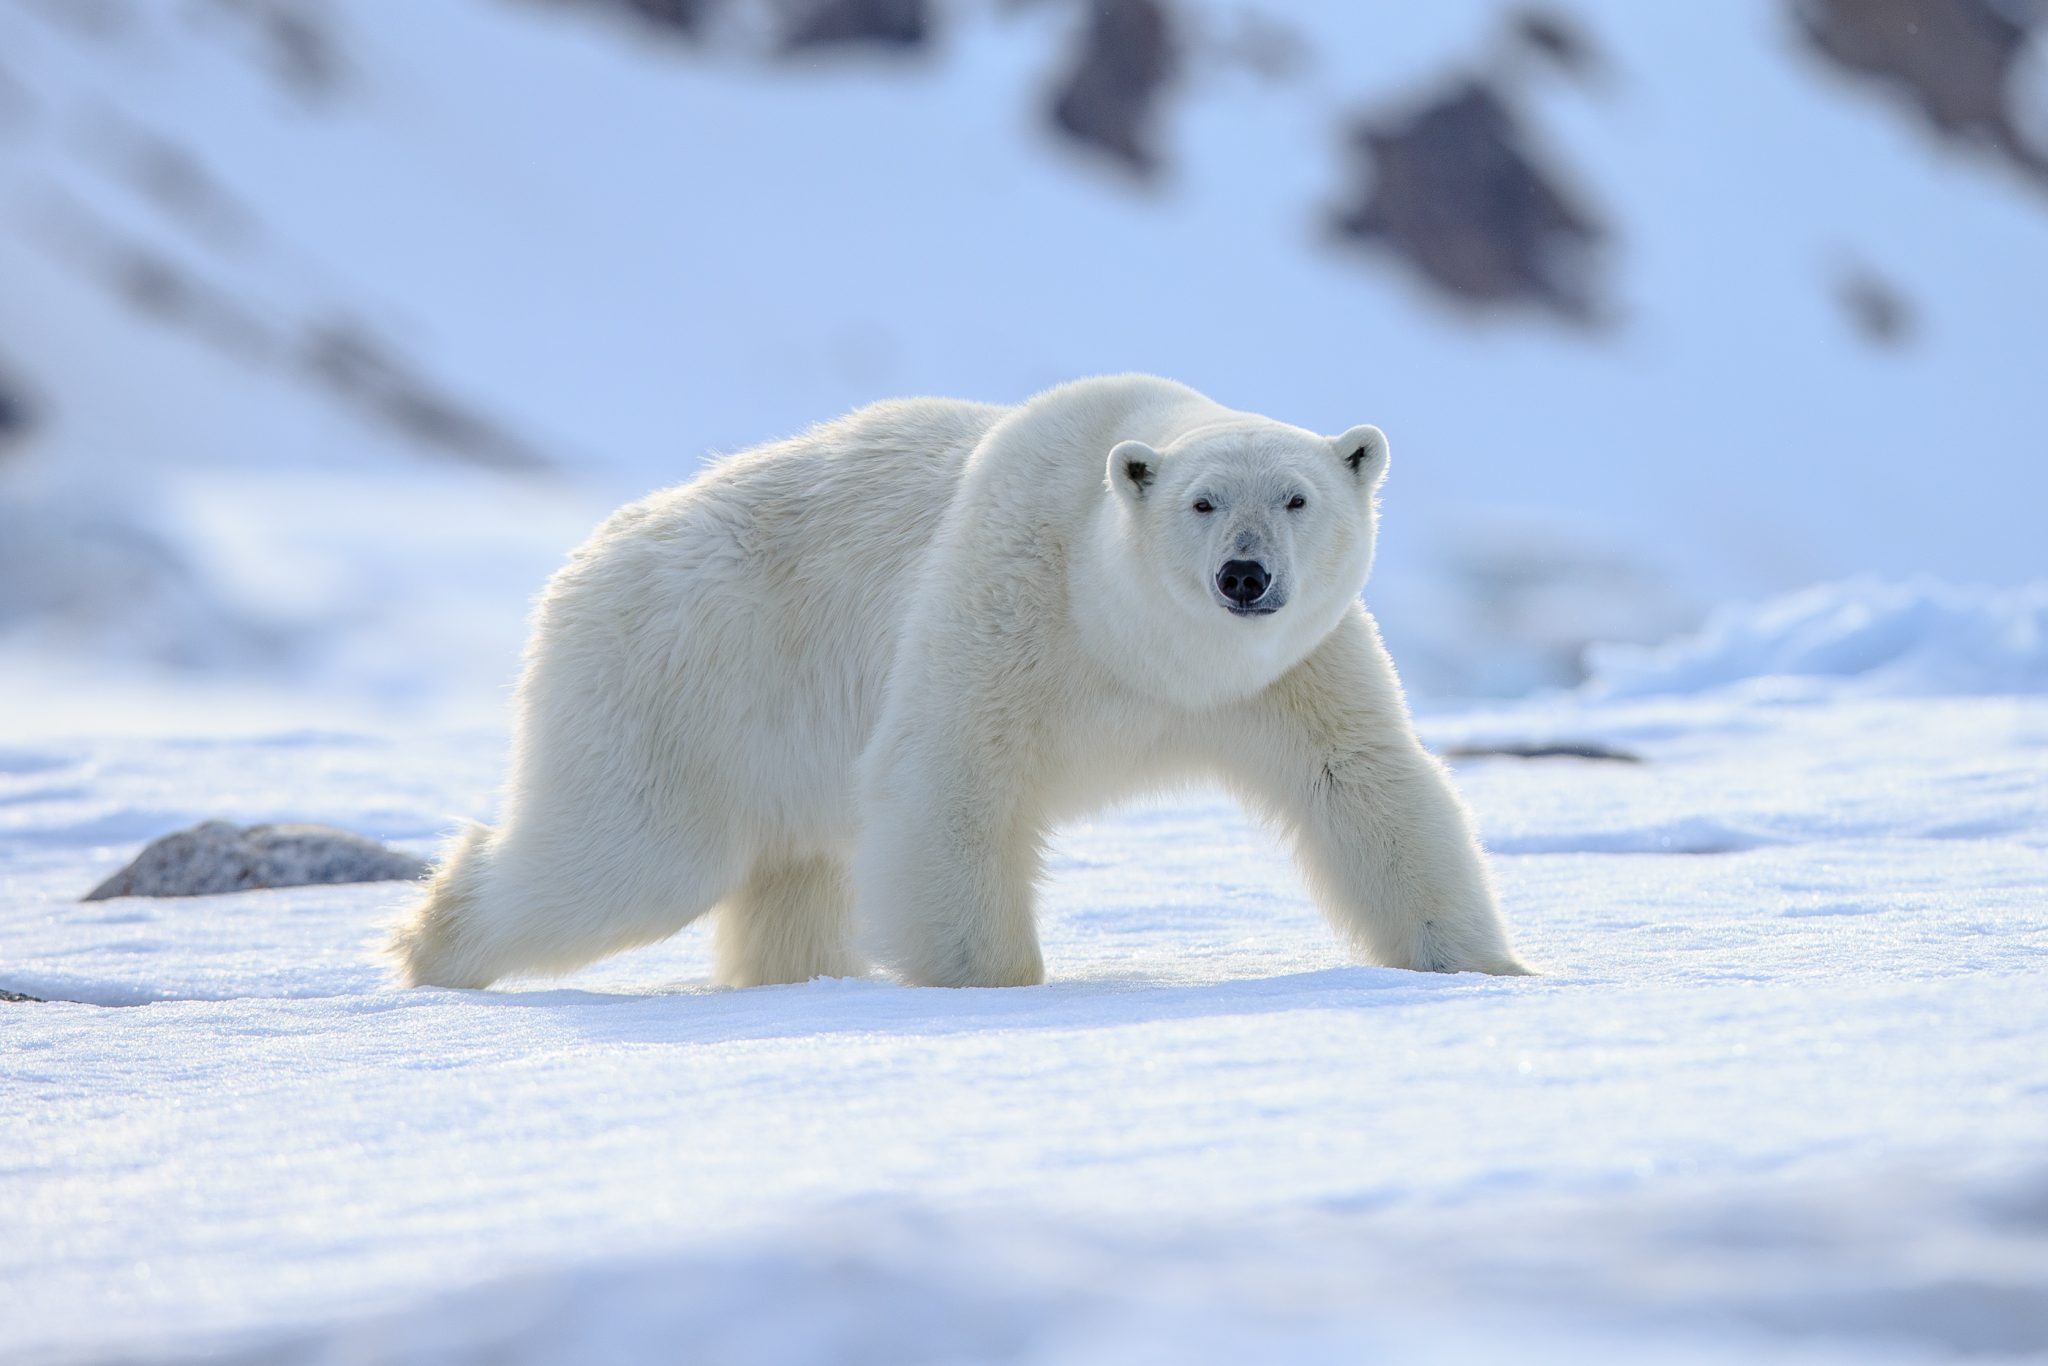 Petition: Ban Polar Bear Trophy Hunting